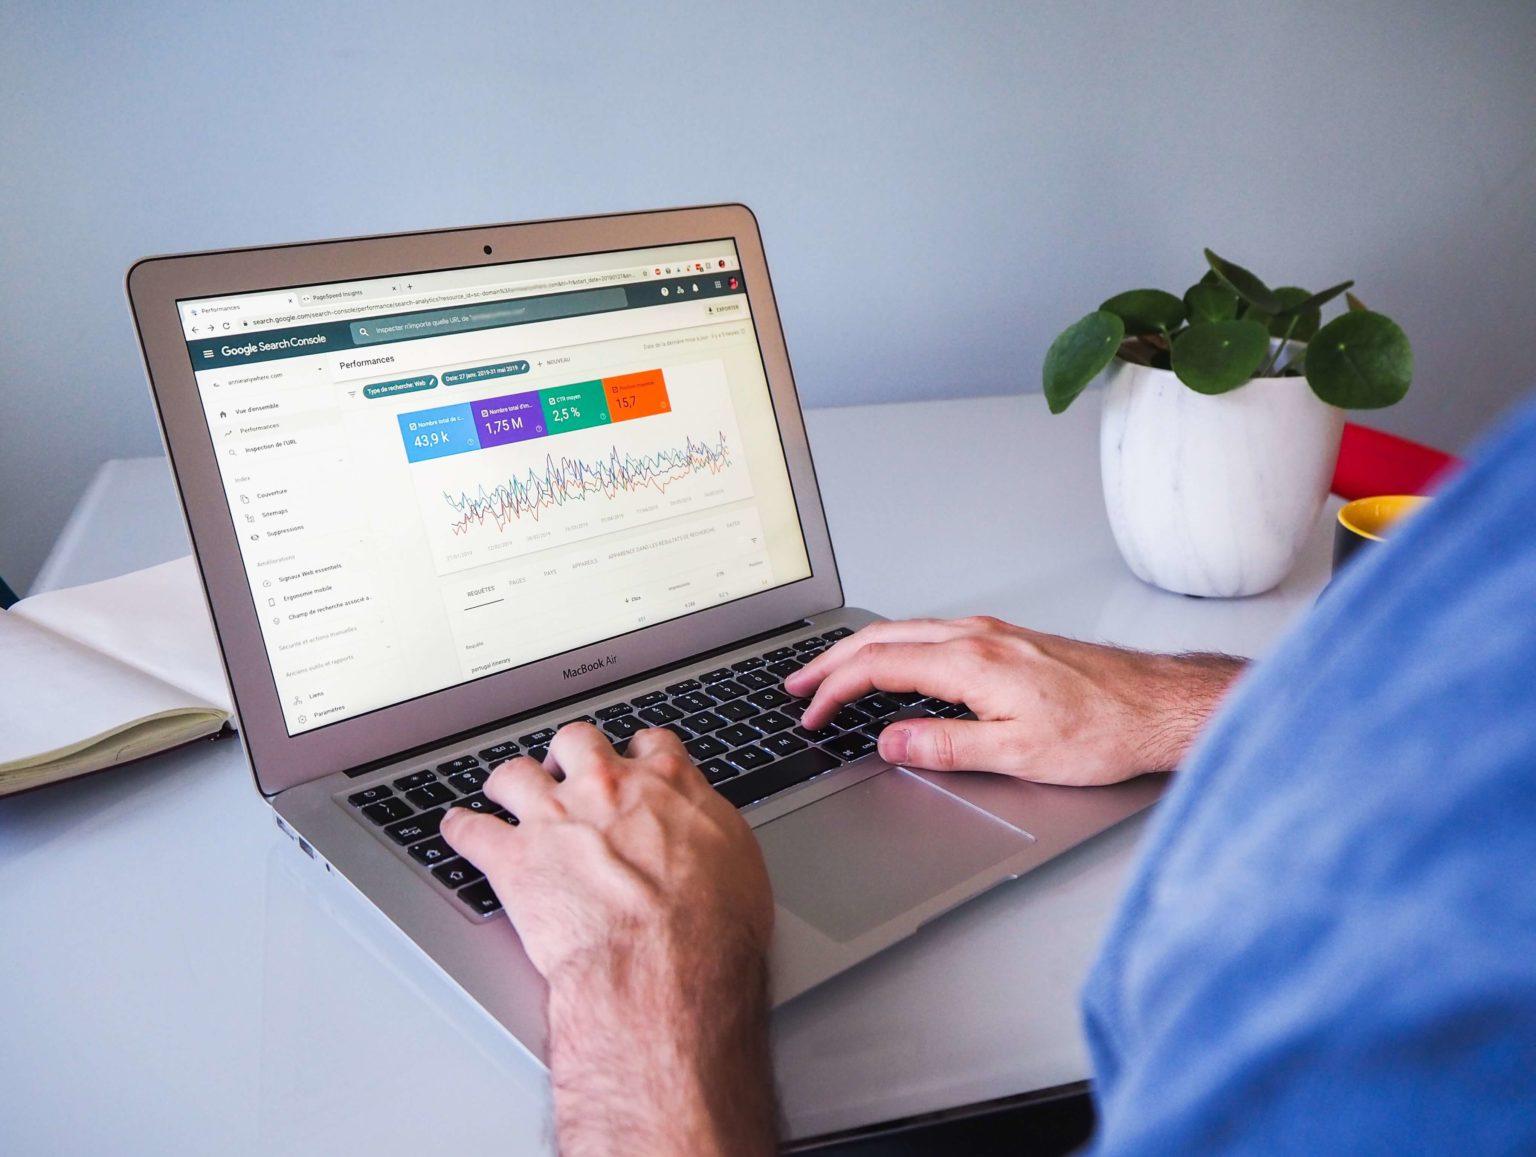 Macbook Air Google Search Console